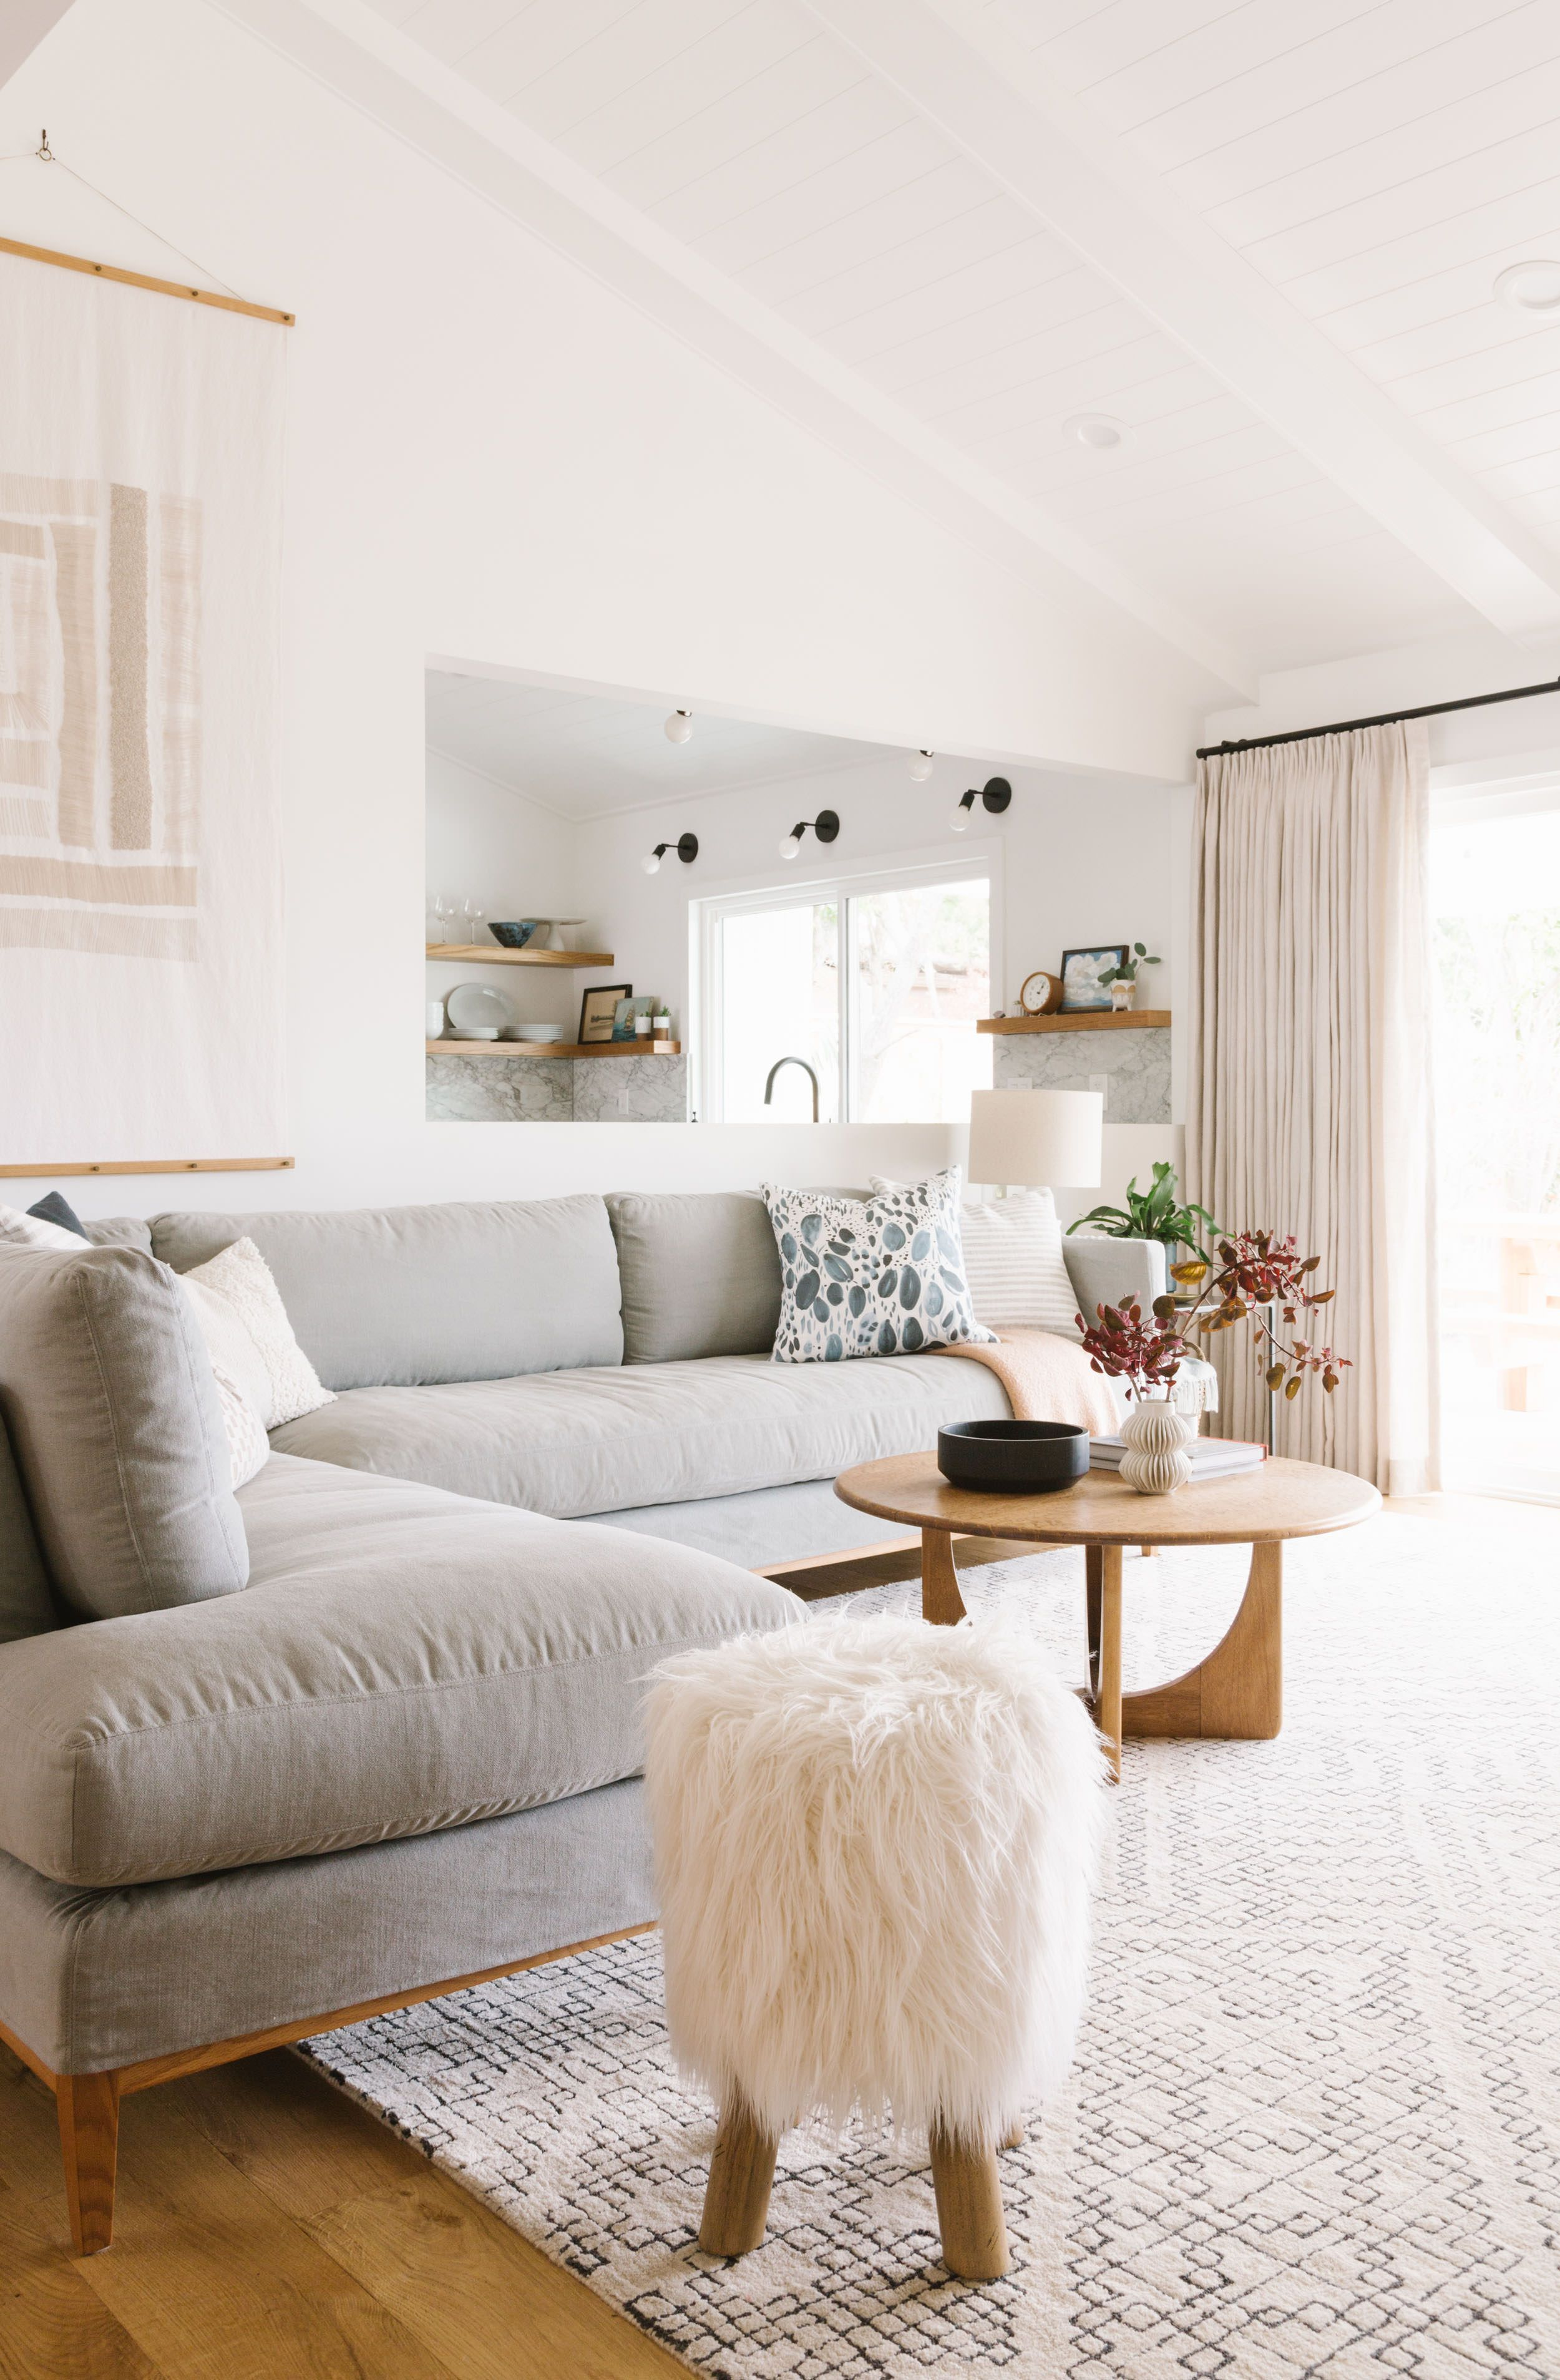 Minimalist decor plants succulents minimalist bedroom kids platform